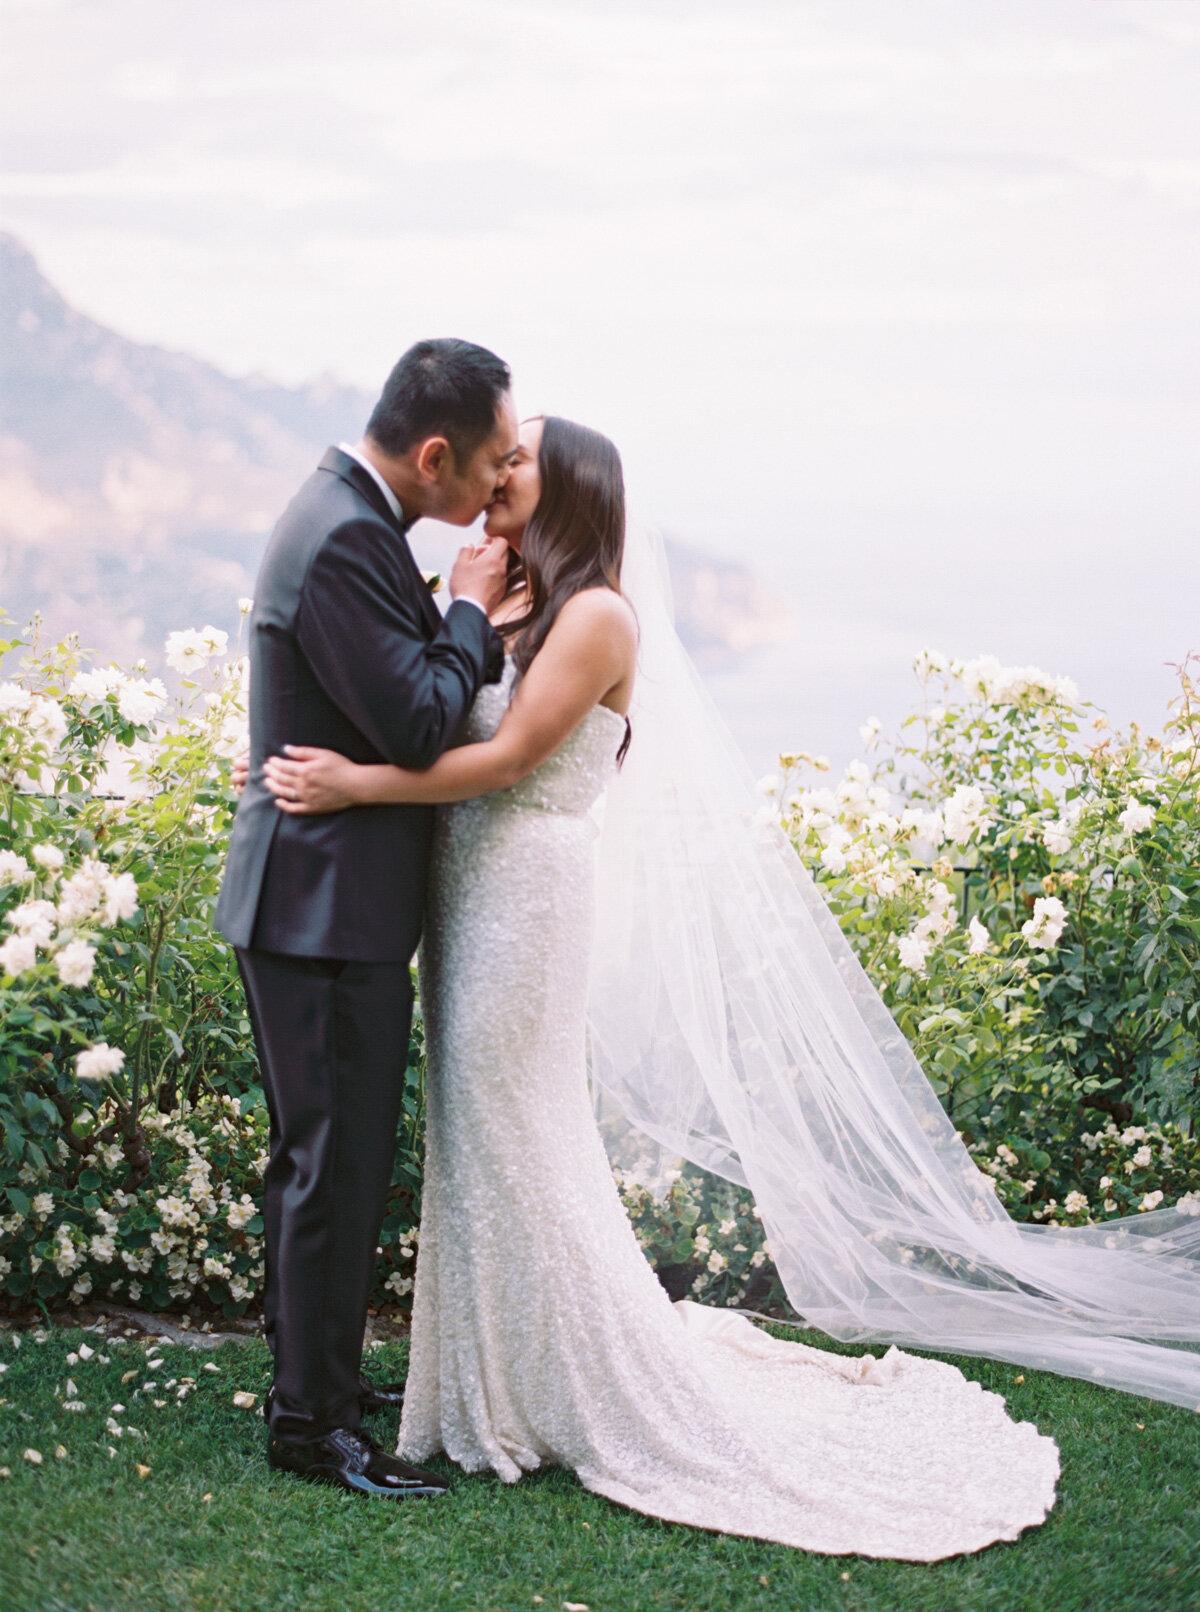 Belmond-Hotel-Caruso-ravello-elopement-Katie-Grant-destination-wedding (38 of 50).jpg